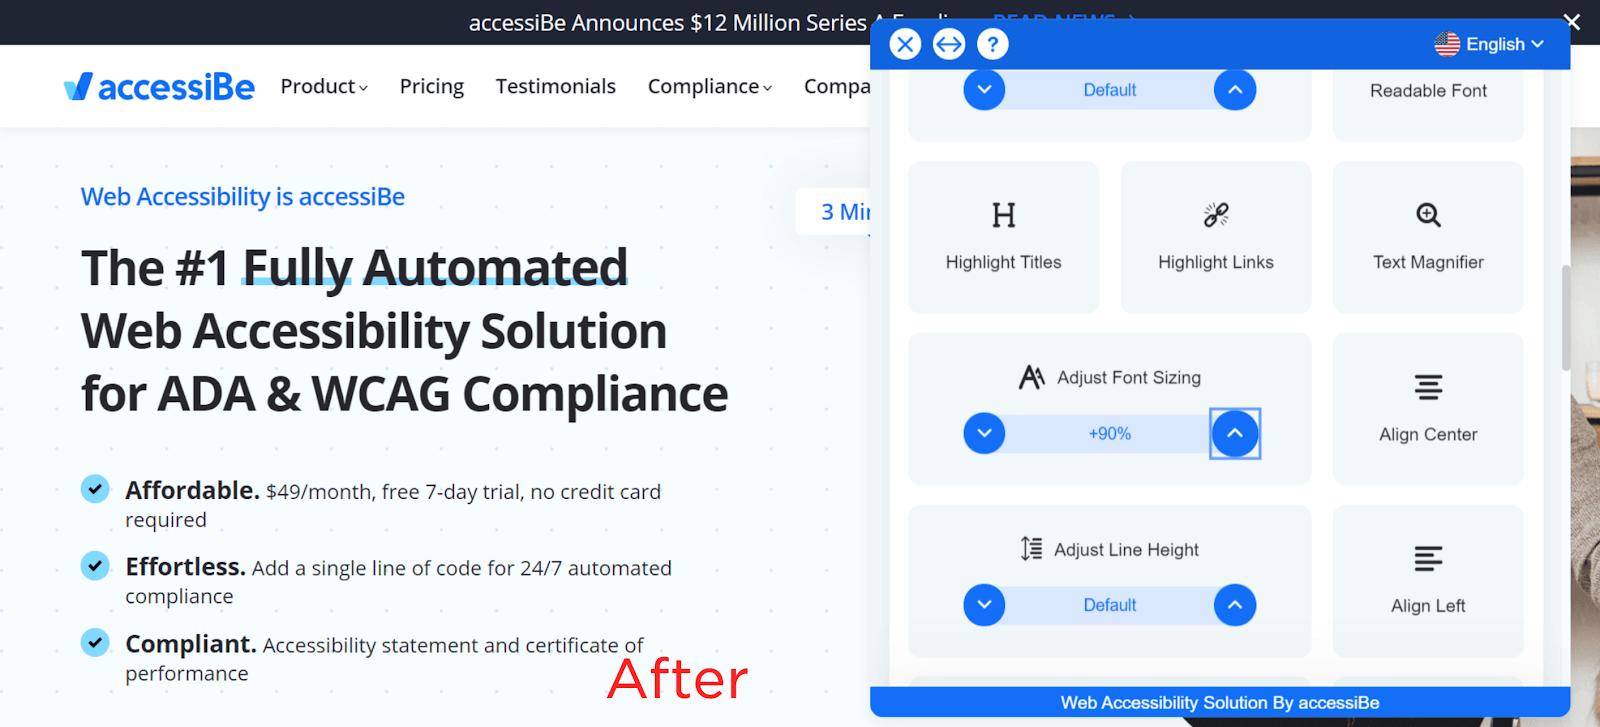 Adjust Font Sizing 2